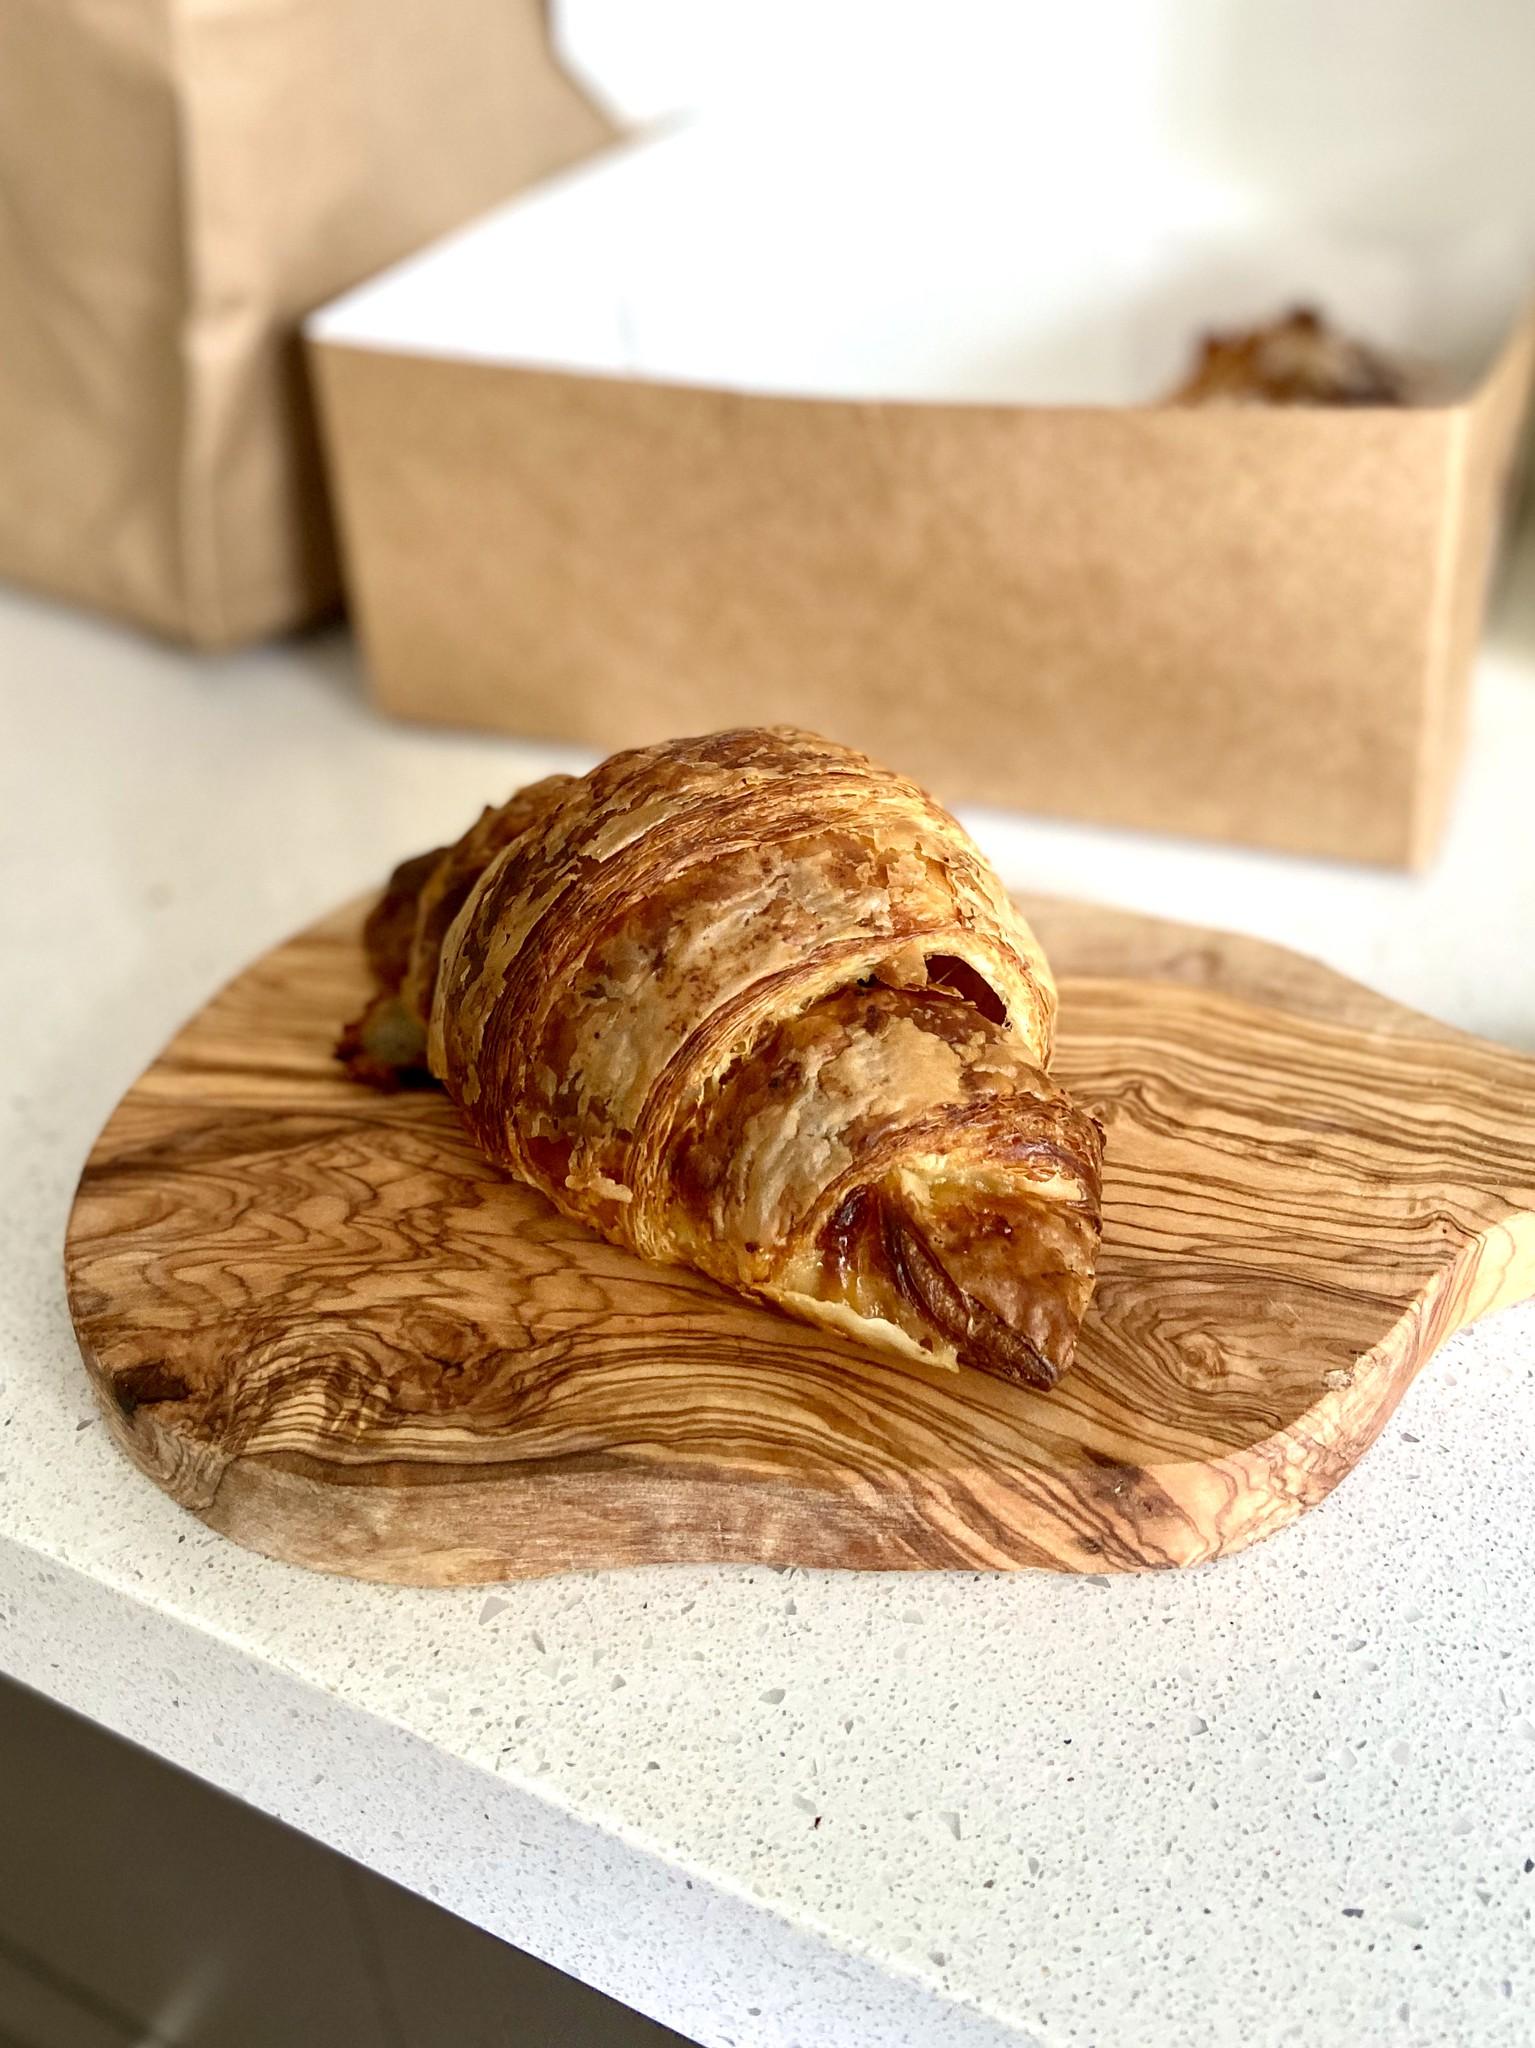 It's Brisket B*tch Croissant - Flour & Weirdoughs (Key Biscayne)